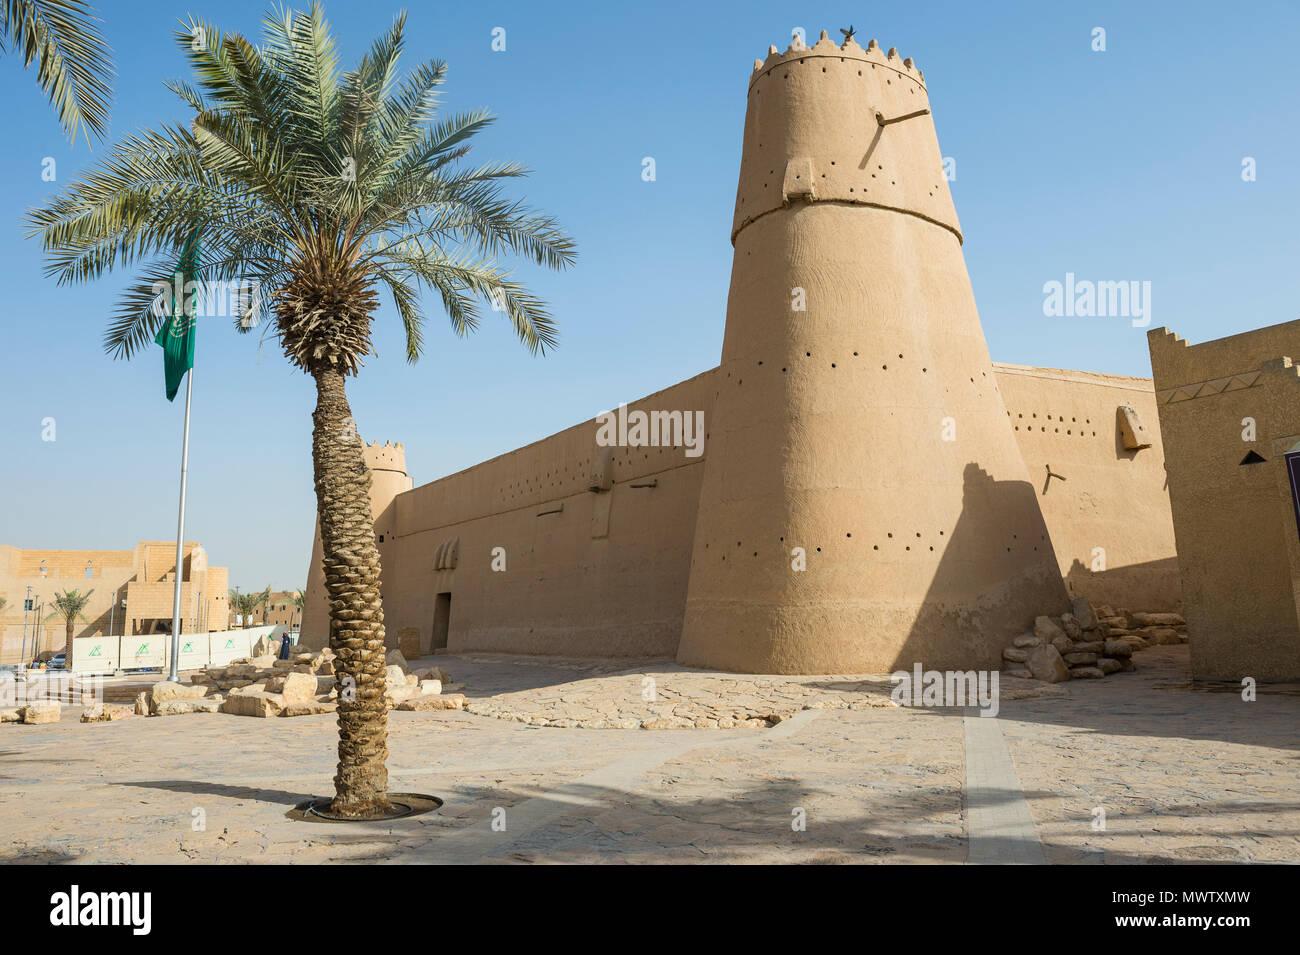 Masmak Fort, Riyadh, Arabia Saudita, Medio Oriente Immagini Stock